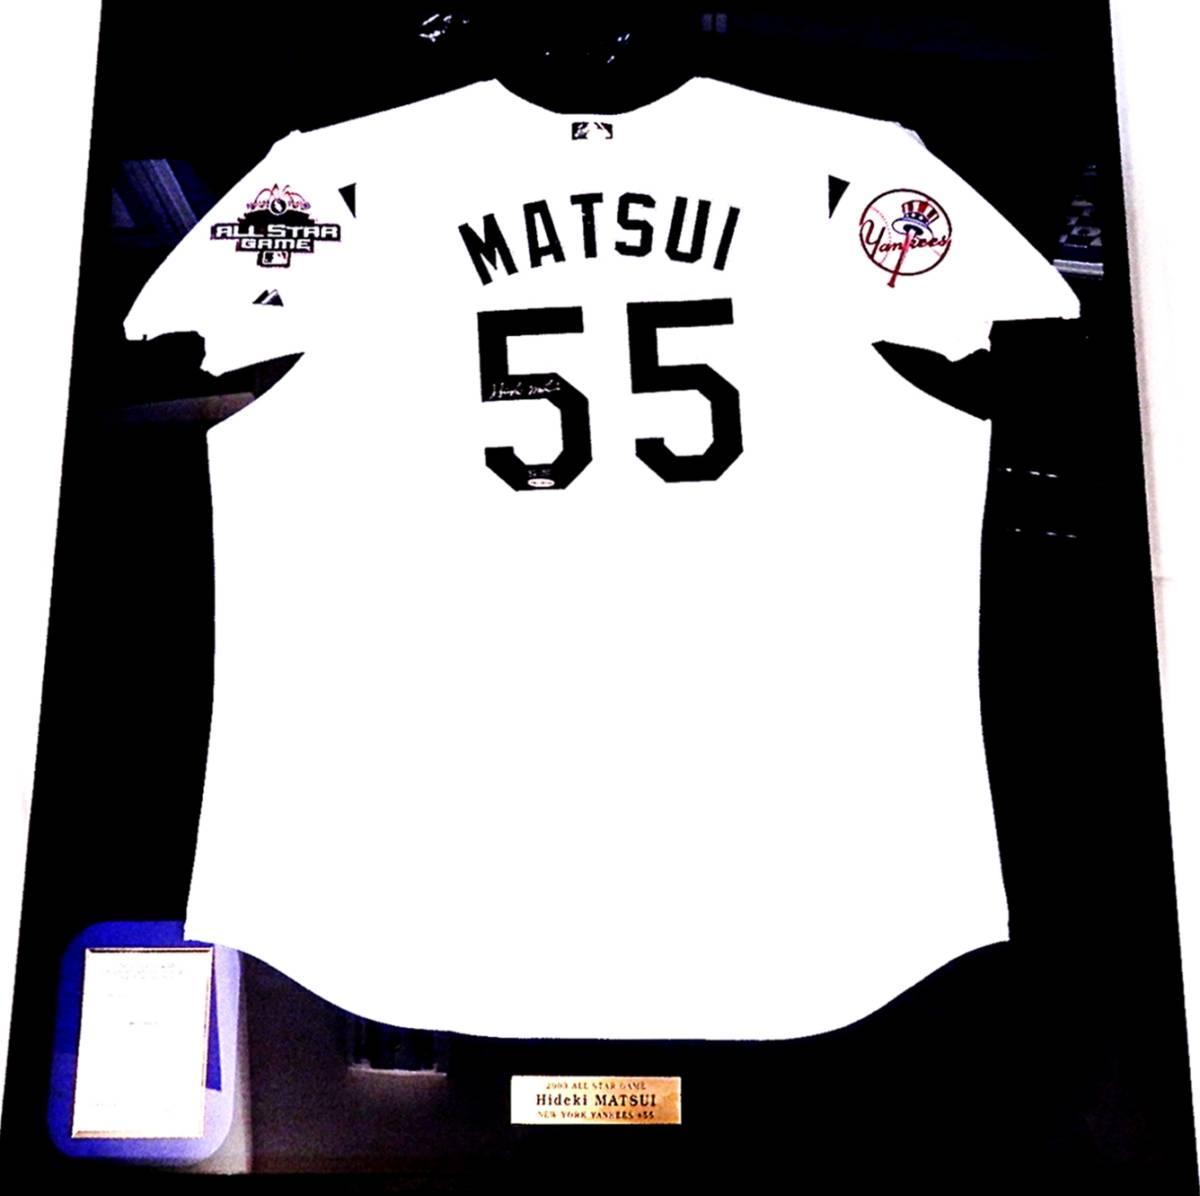 MLB オールスター 松井秀喜選手 直筆サインユニフォーム 155限定 UDA